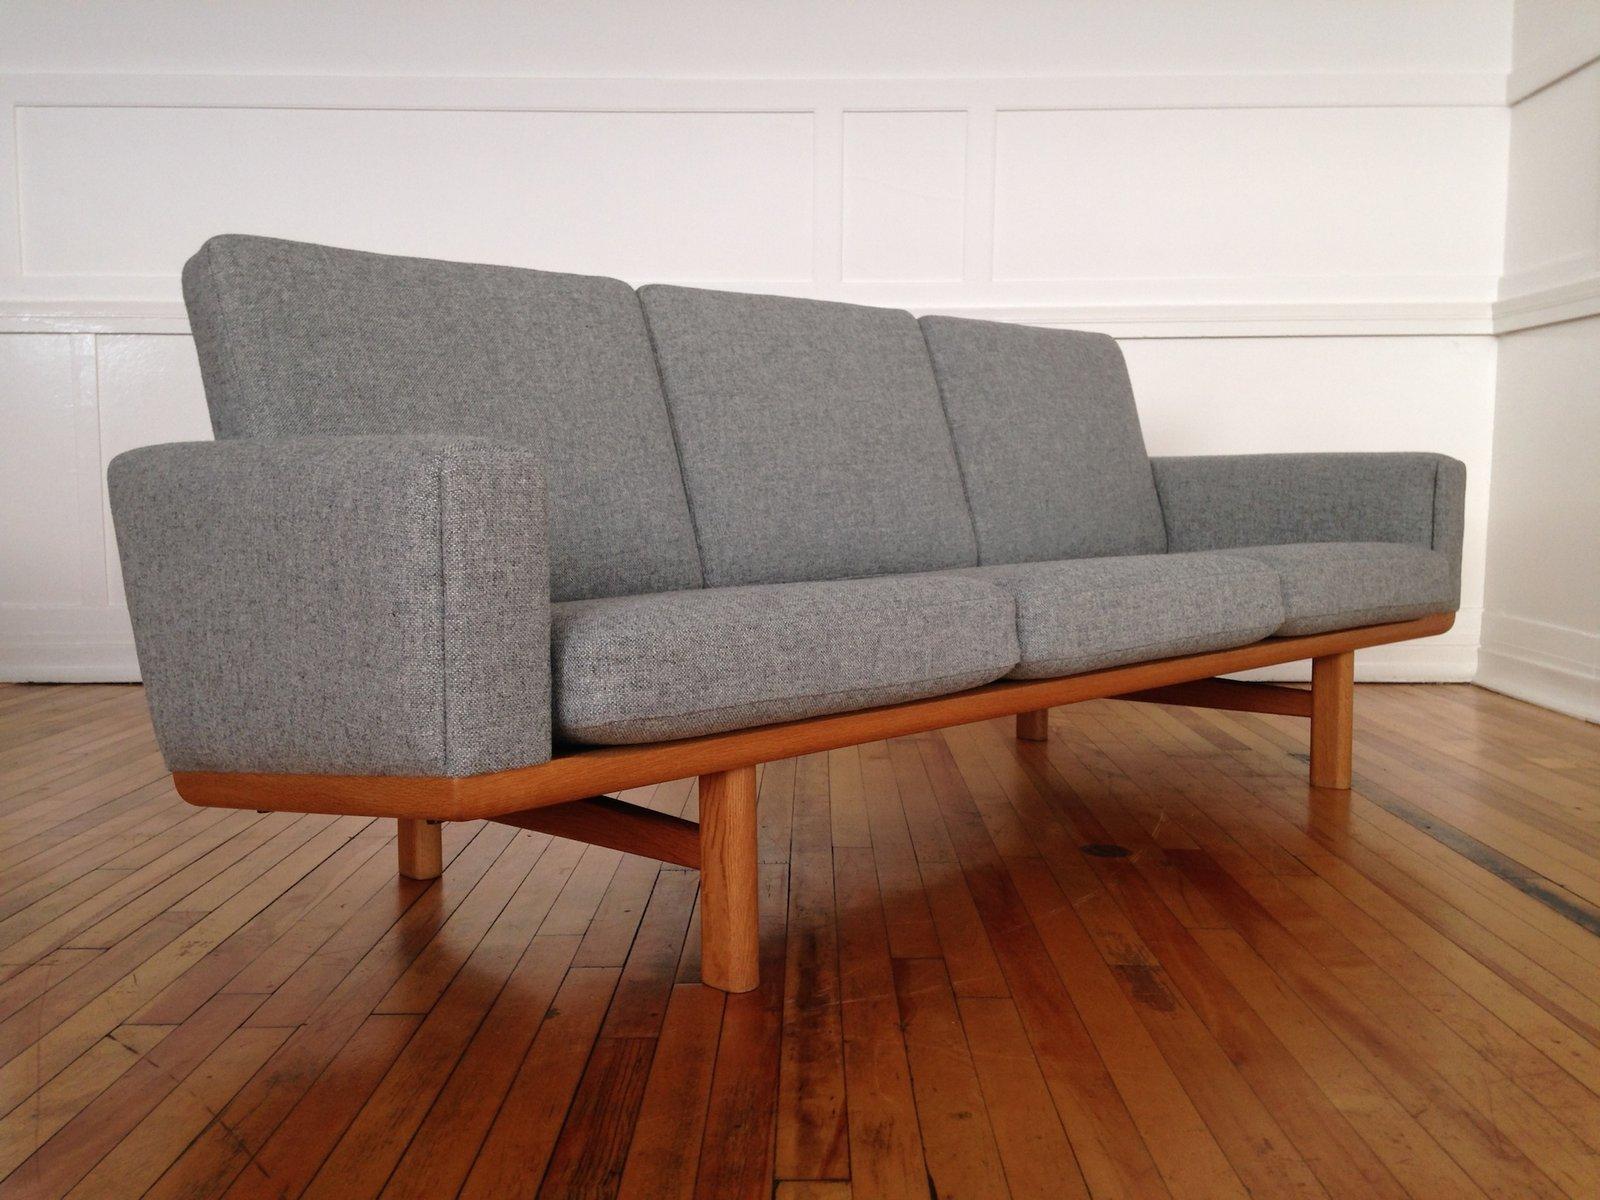 mid century danish oak kvadrat wool sofa model ge236 by hans wegner for getama for sale at pamono. Black Bedroom Furniture Sets. Home Design Ideas